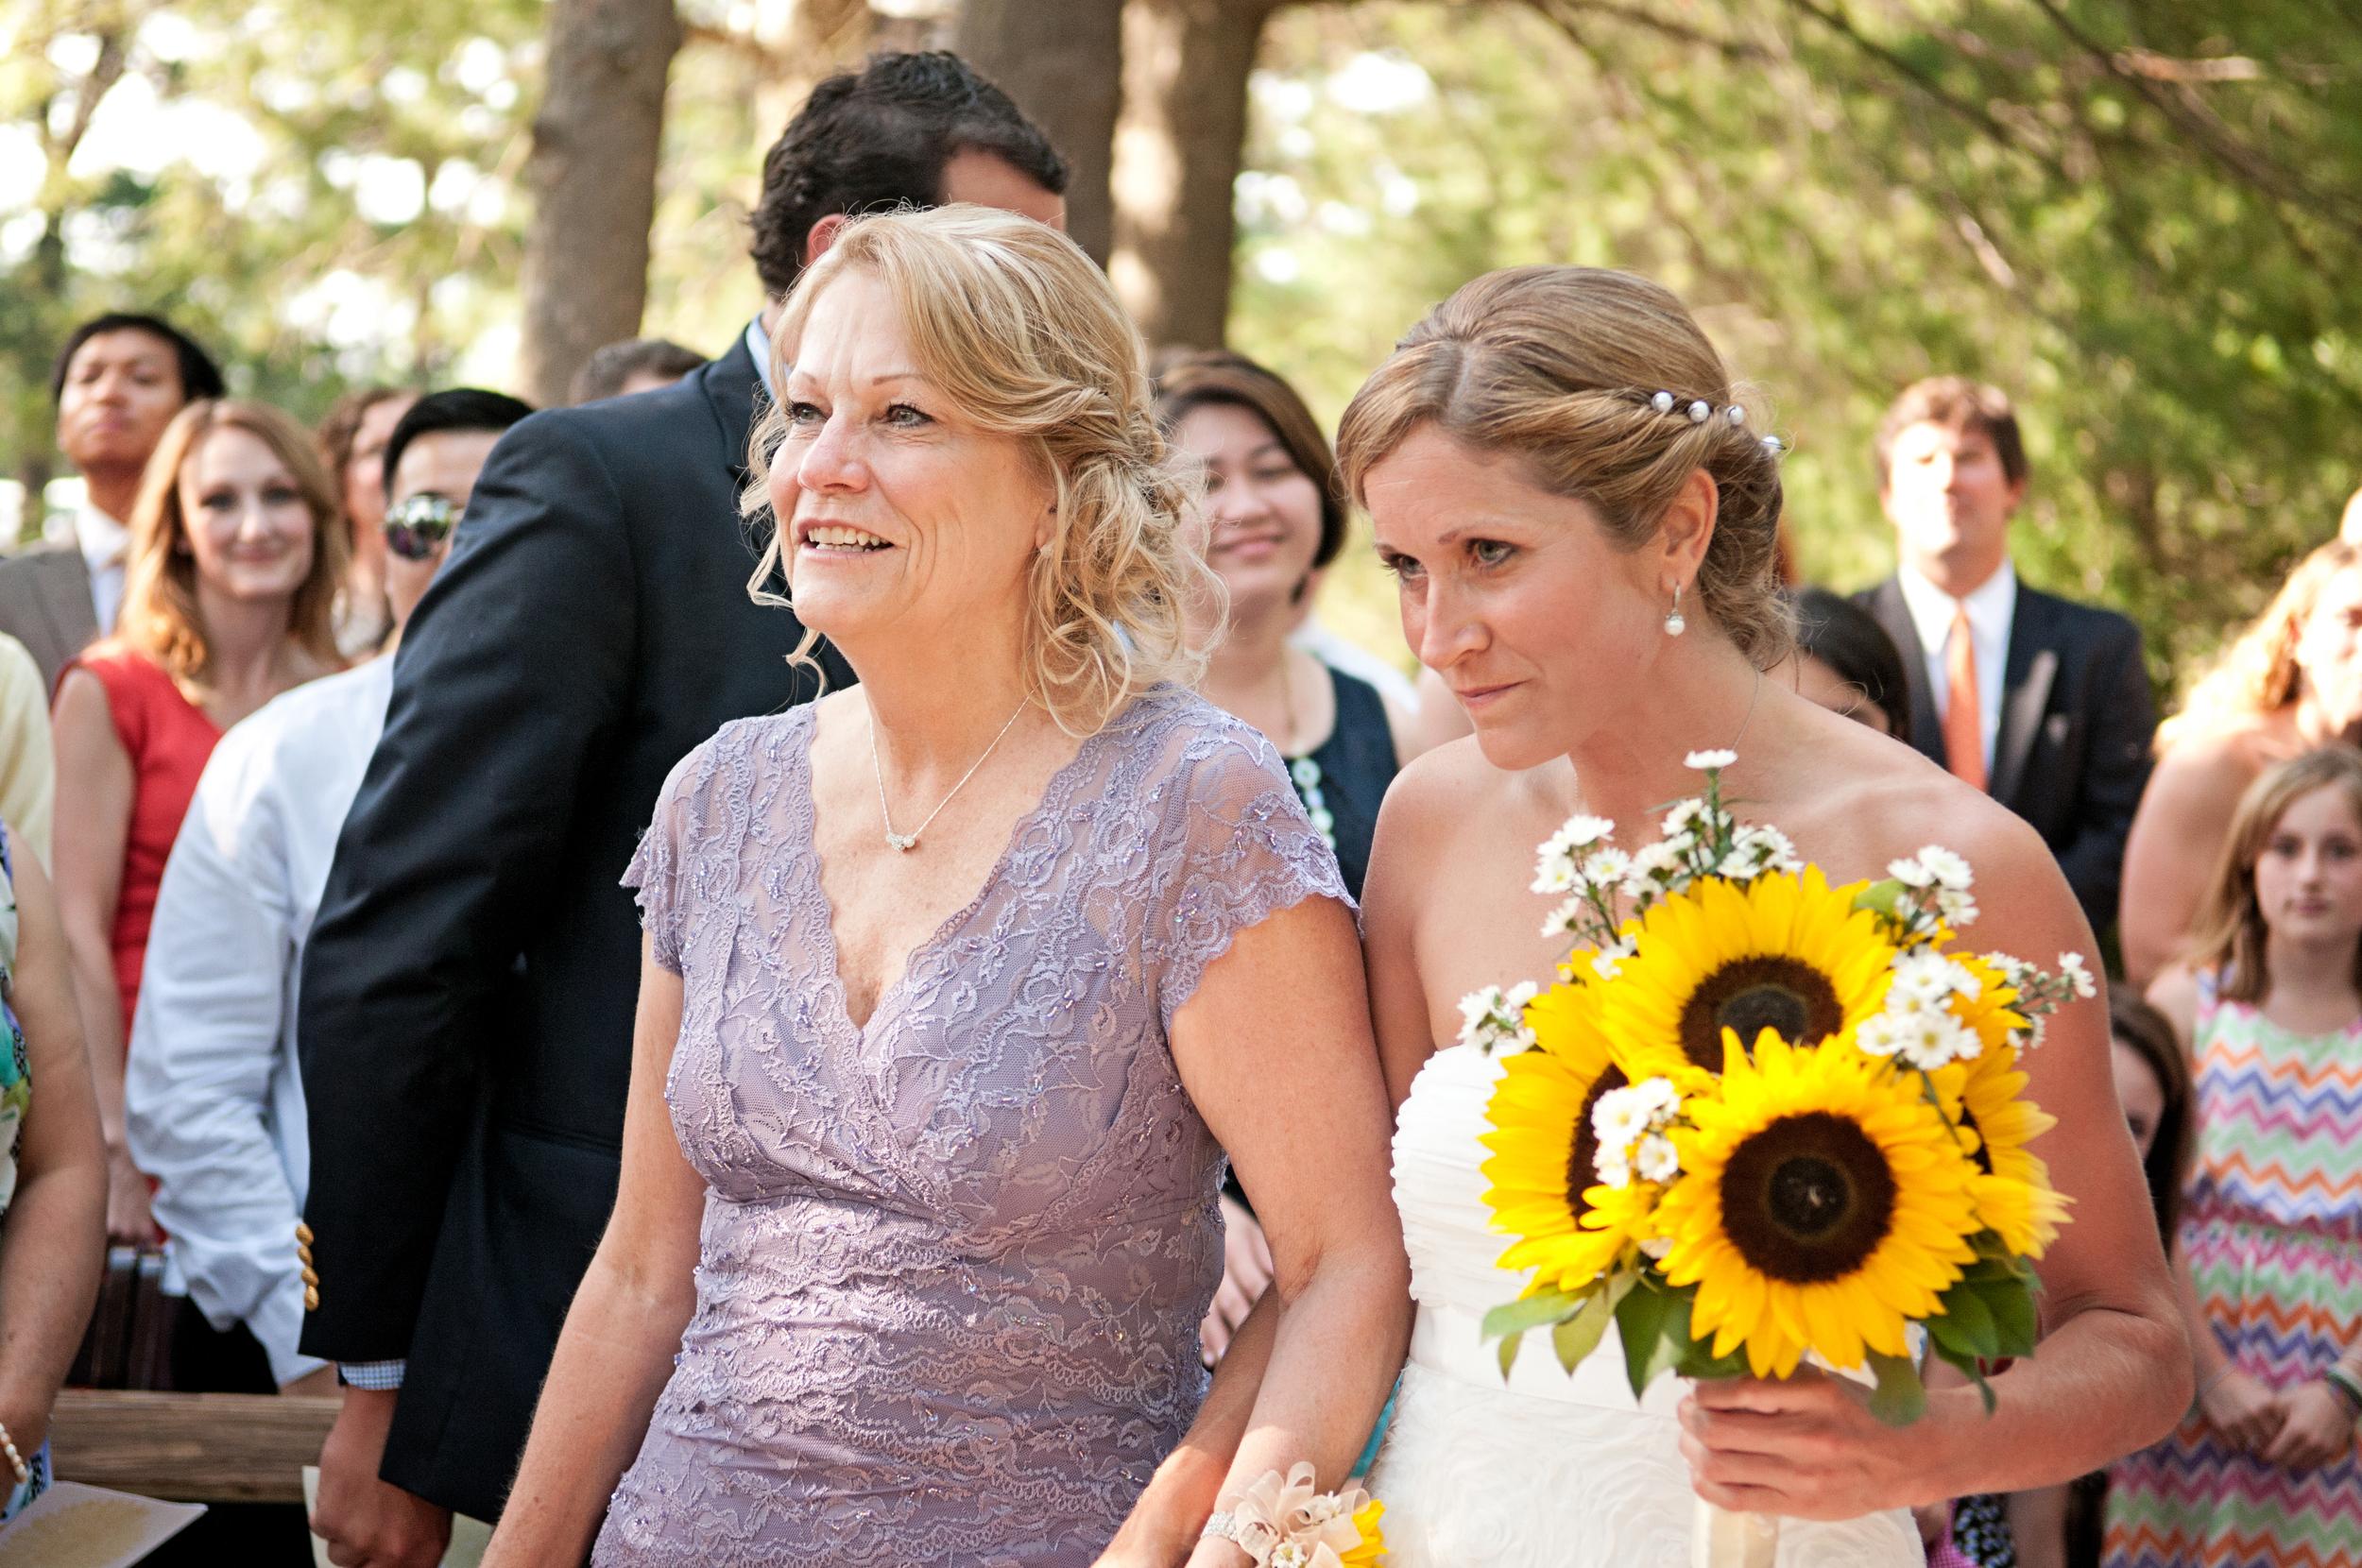 Angela_Chicoski_CT_wedding_photographer_023.jpg